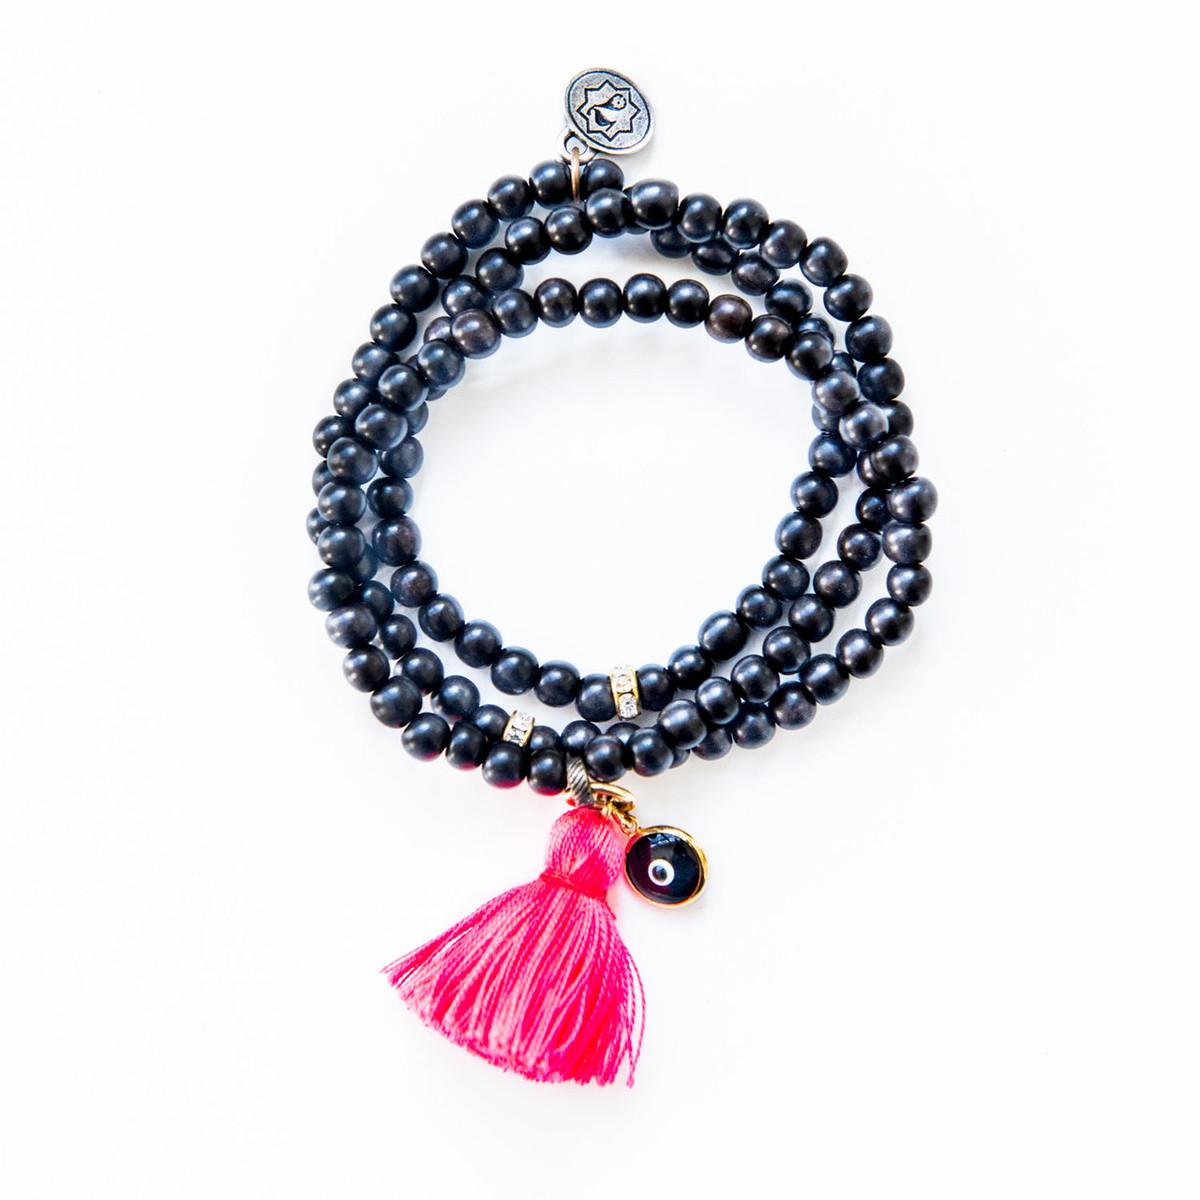 Triple Wrap Ebony Wood Bracelet / Necklace Kabbalah Charm